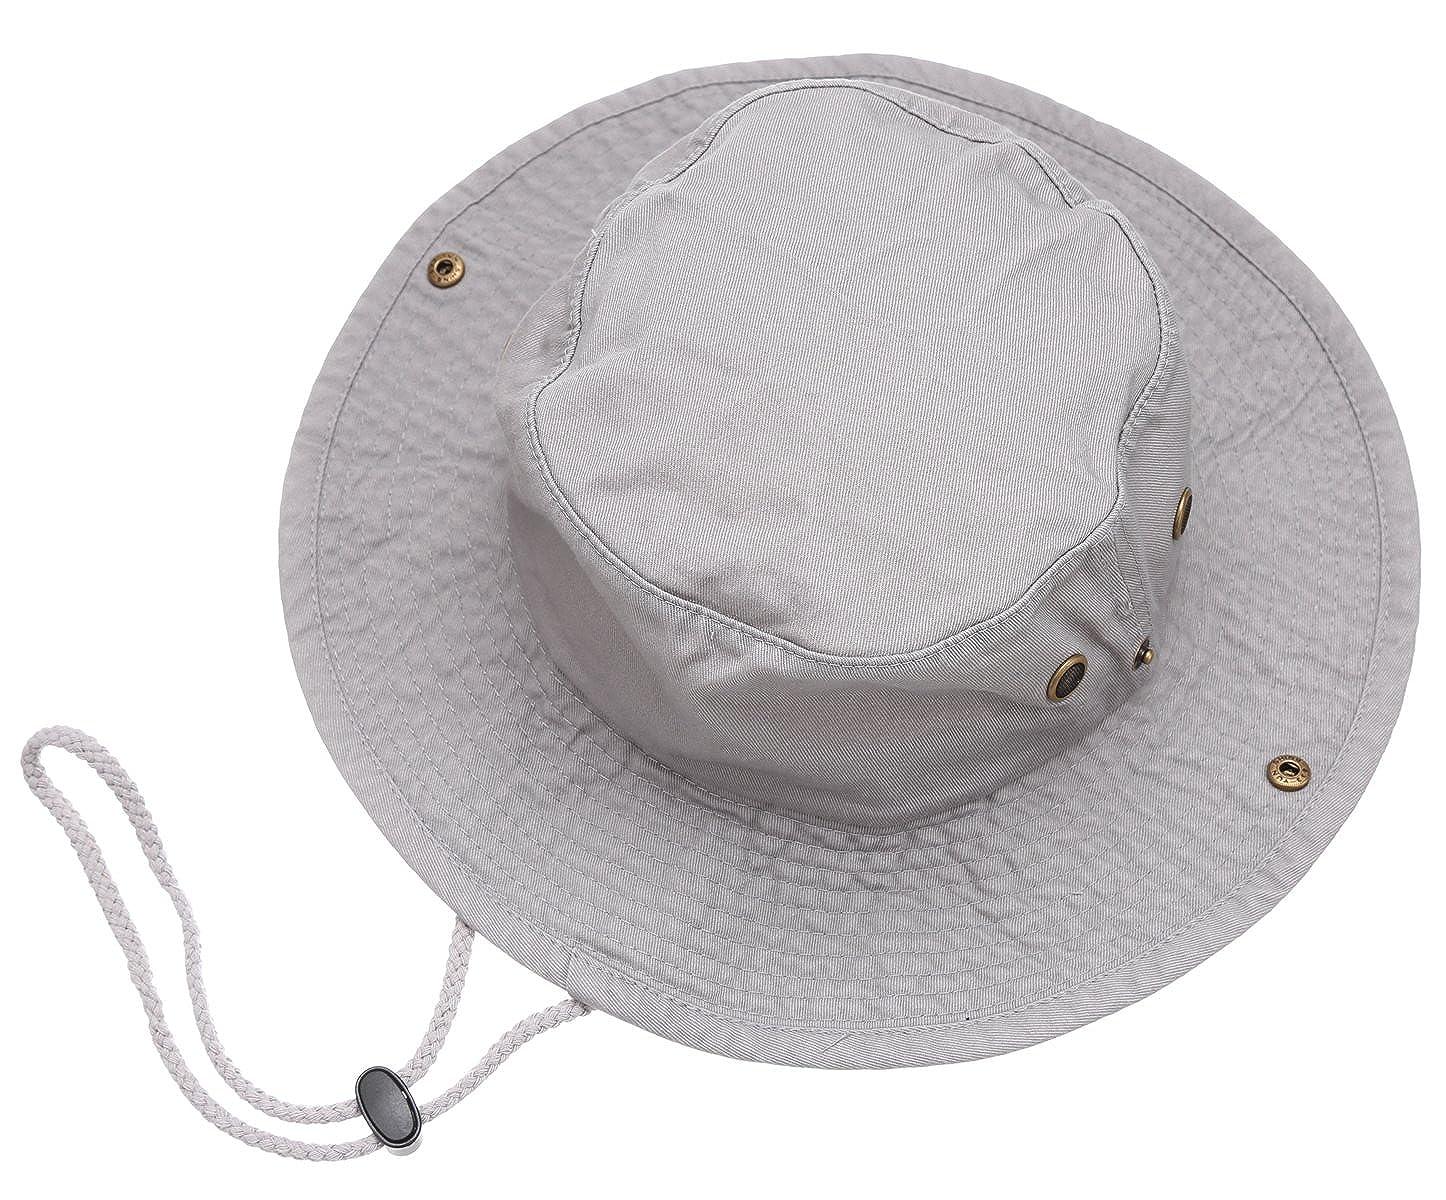 Summer Outdoor Boonie Hunting Fishing Safari Bucket Sun Hat with adjustable  strap(Grey c39662370ce9